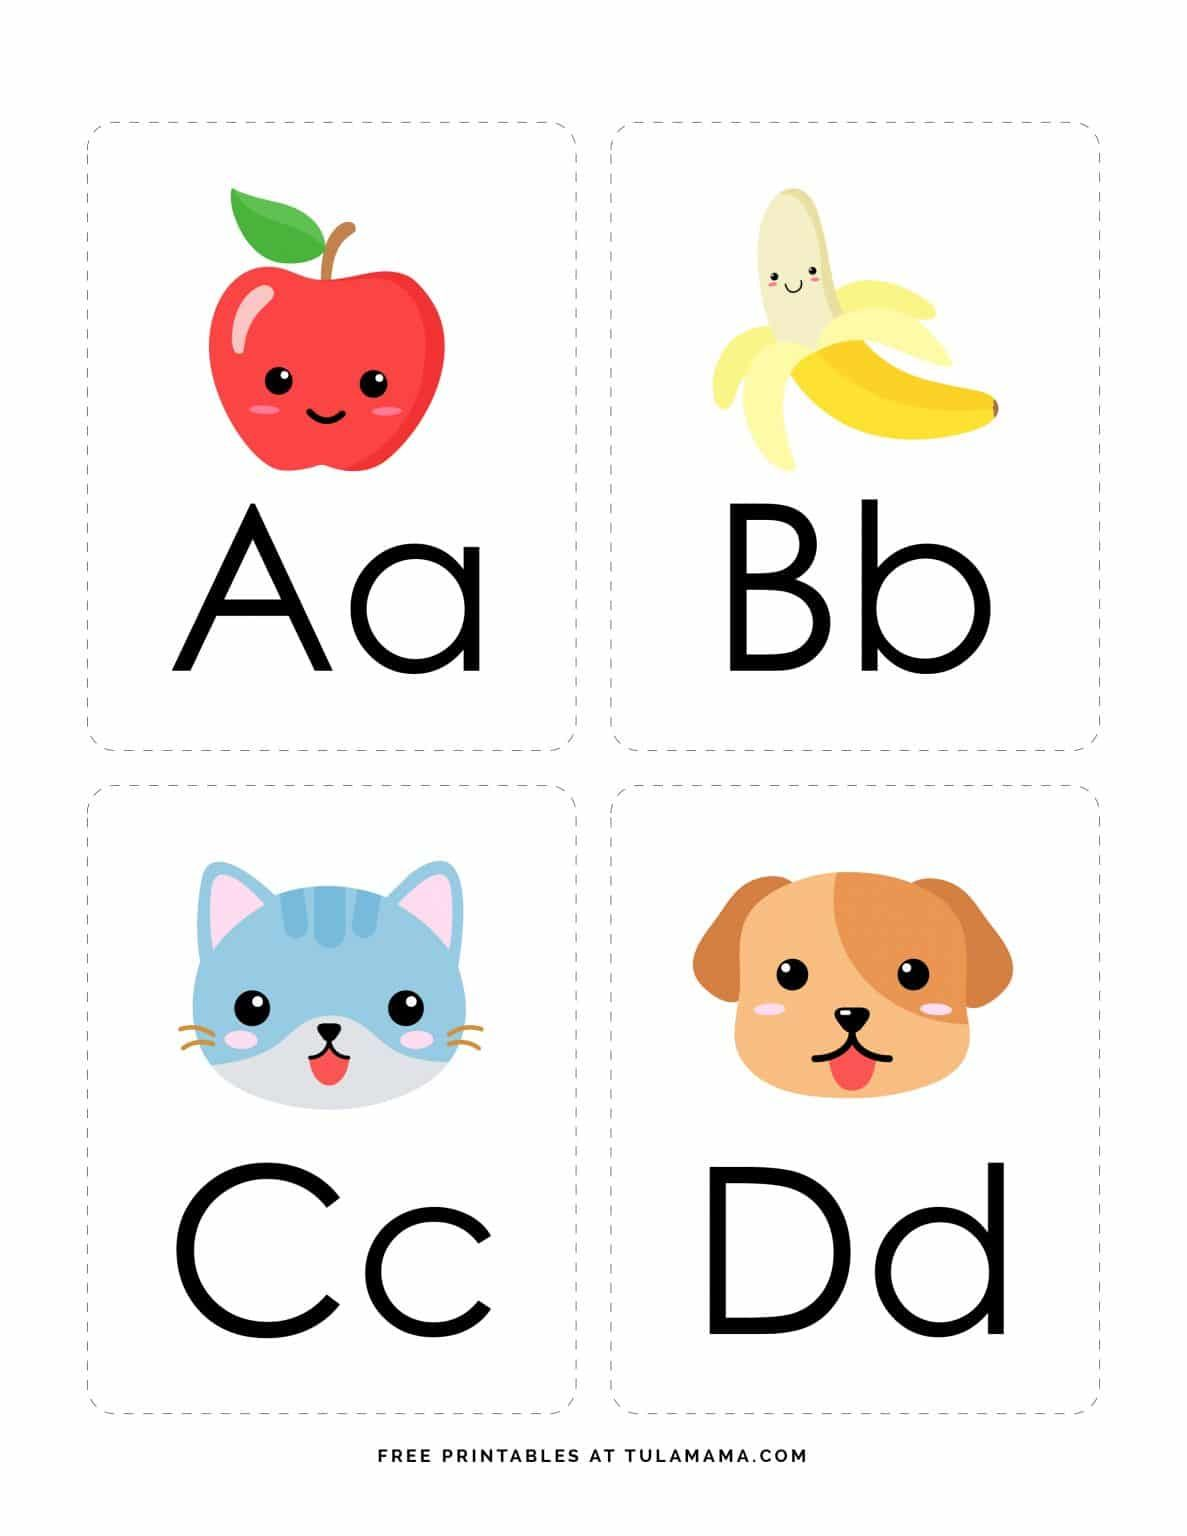 Fun Free Engaging Alphabet Flash Cards For Preschoolers Alphabet Flashcards Printable Flash Cards Abc Flashcards